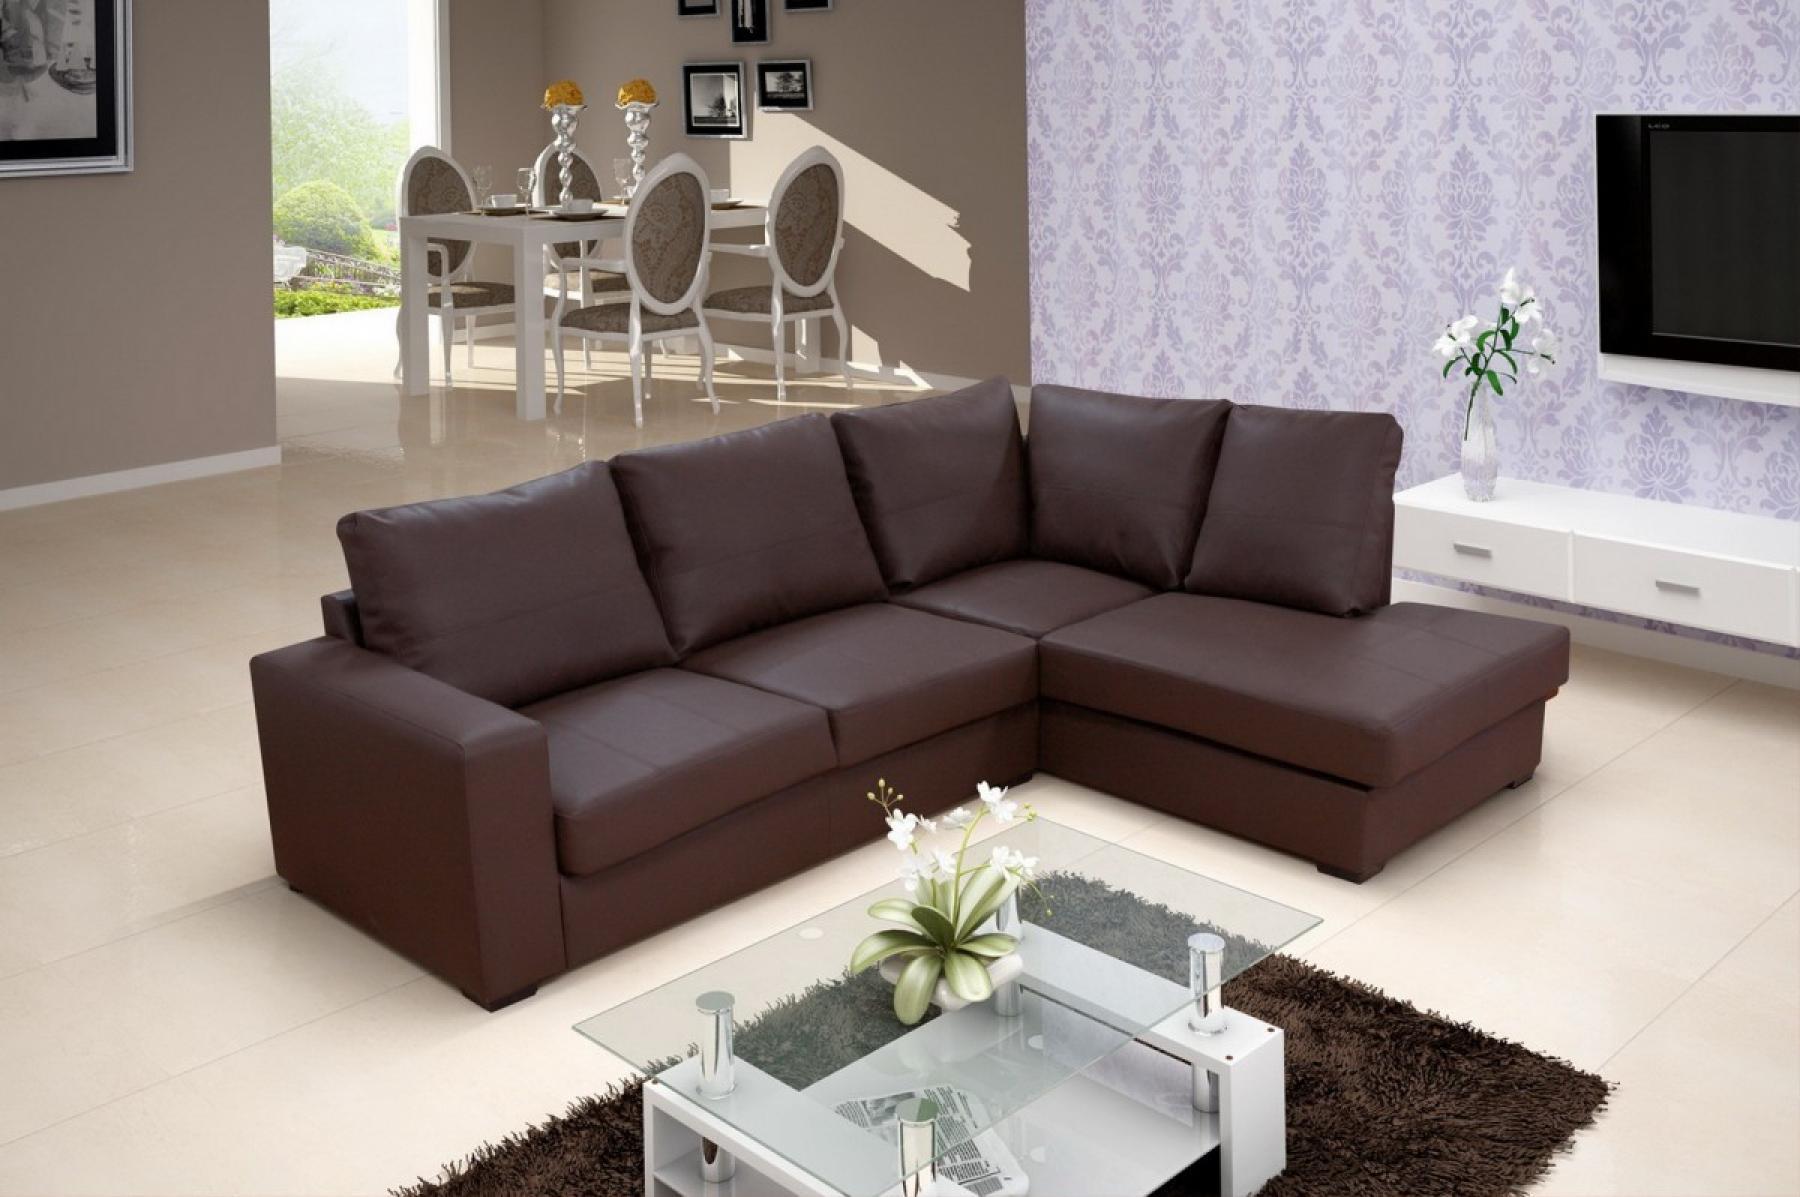 photos canap angle cuir marron. Black Bedroom Furniture Sets. Home Design Ideas